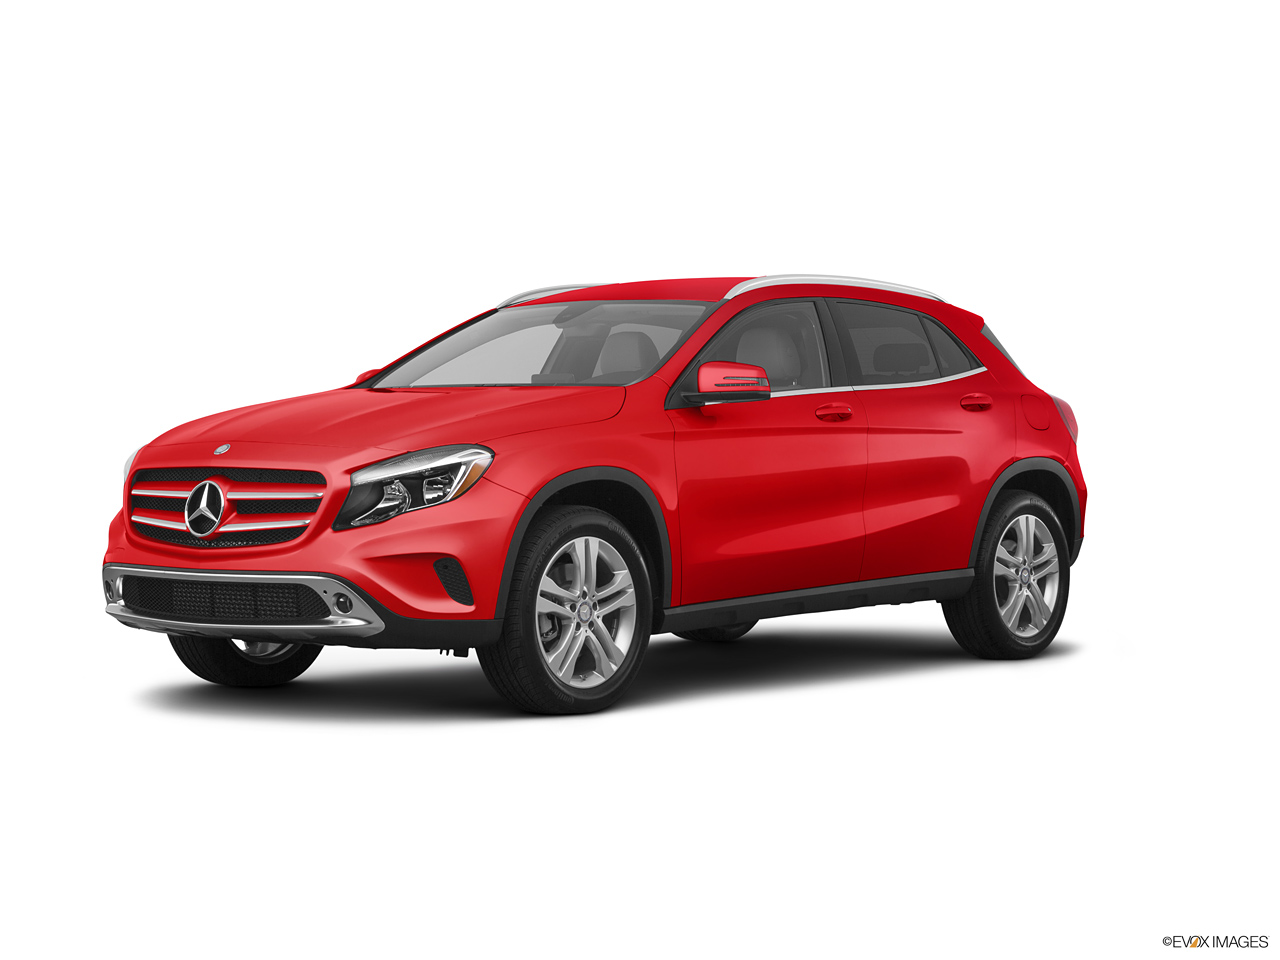 Mercedes benz gla 2017 45 amg in qatar new car prices for Mercedes benz gla 45 amg price